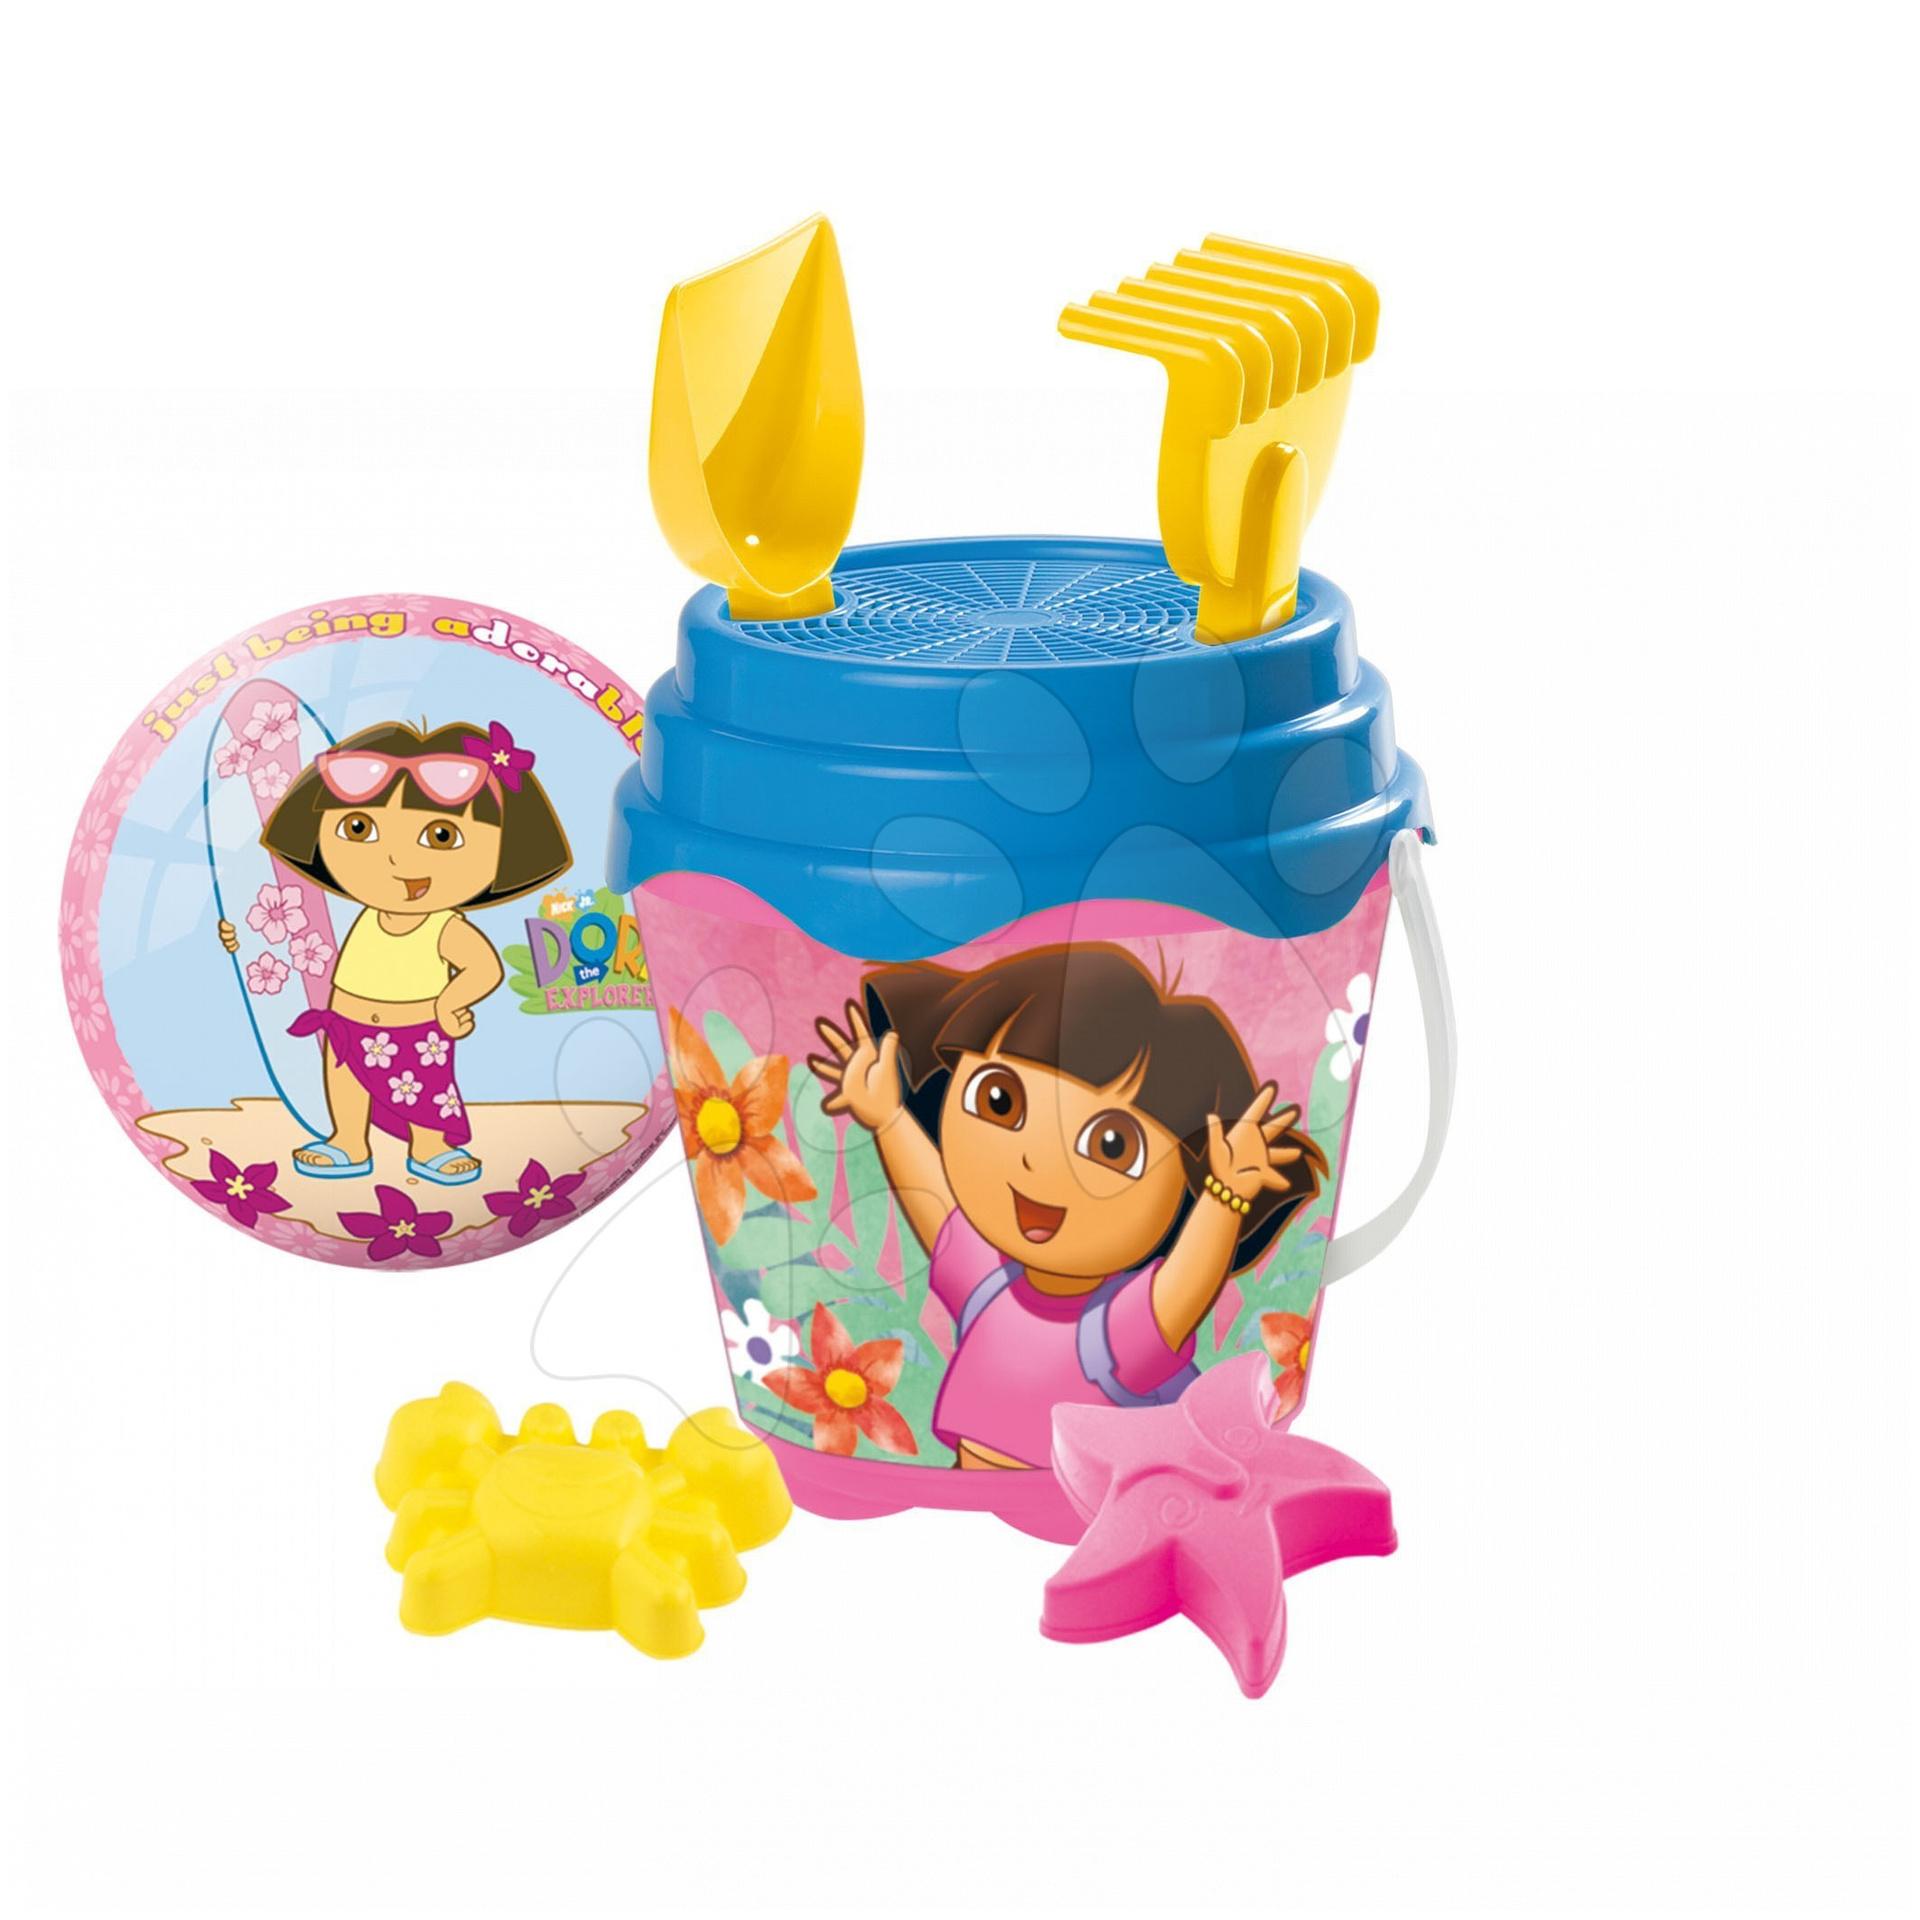 Staré položky - Dora set do písku Mondo kbelík, konvička, sítko, lopatka, hrabičky a dvě bábovičky